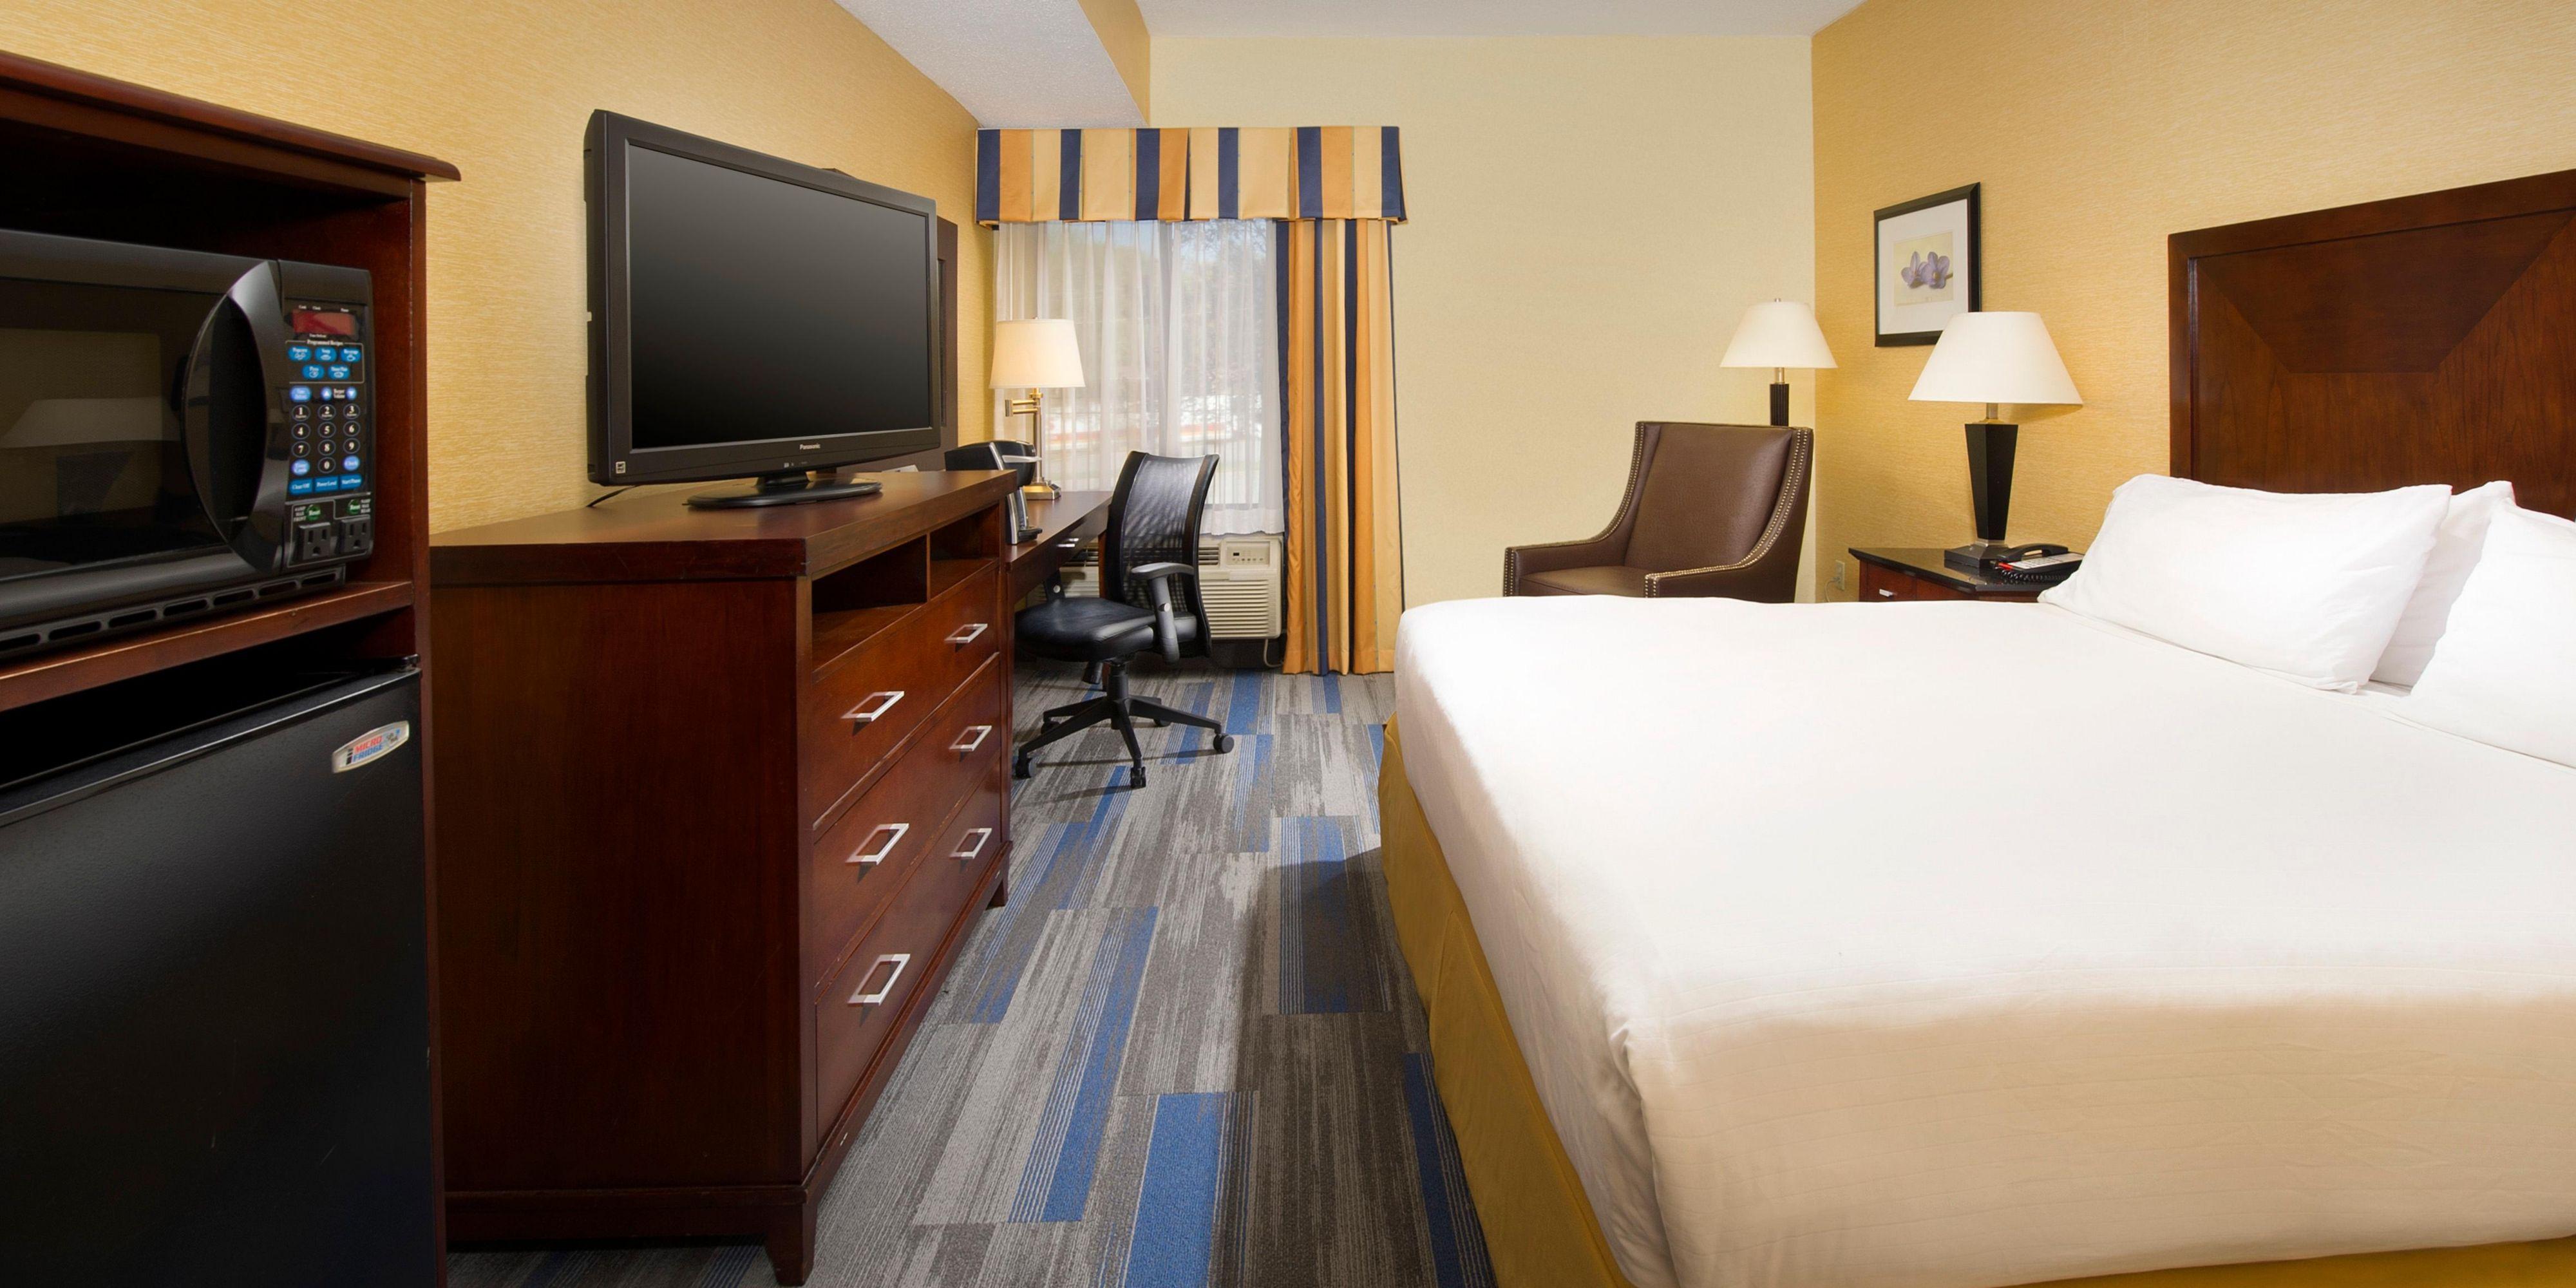 Holiday Inn Express Hyattsville 4471289401 2x1